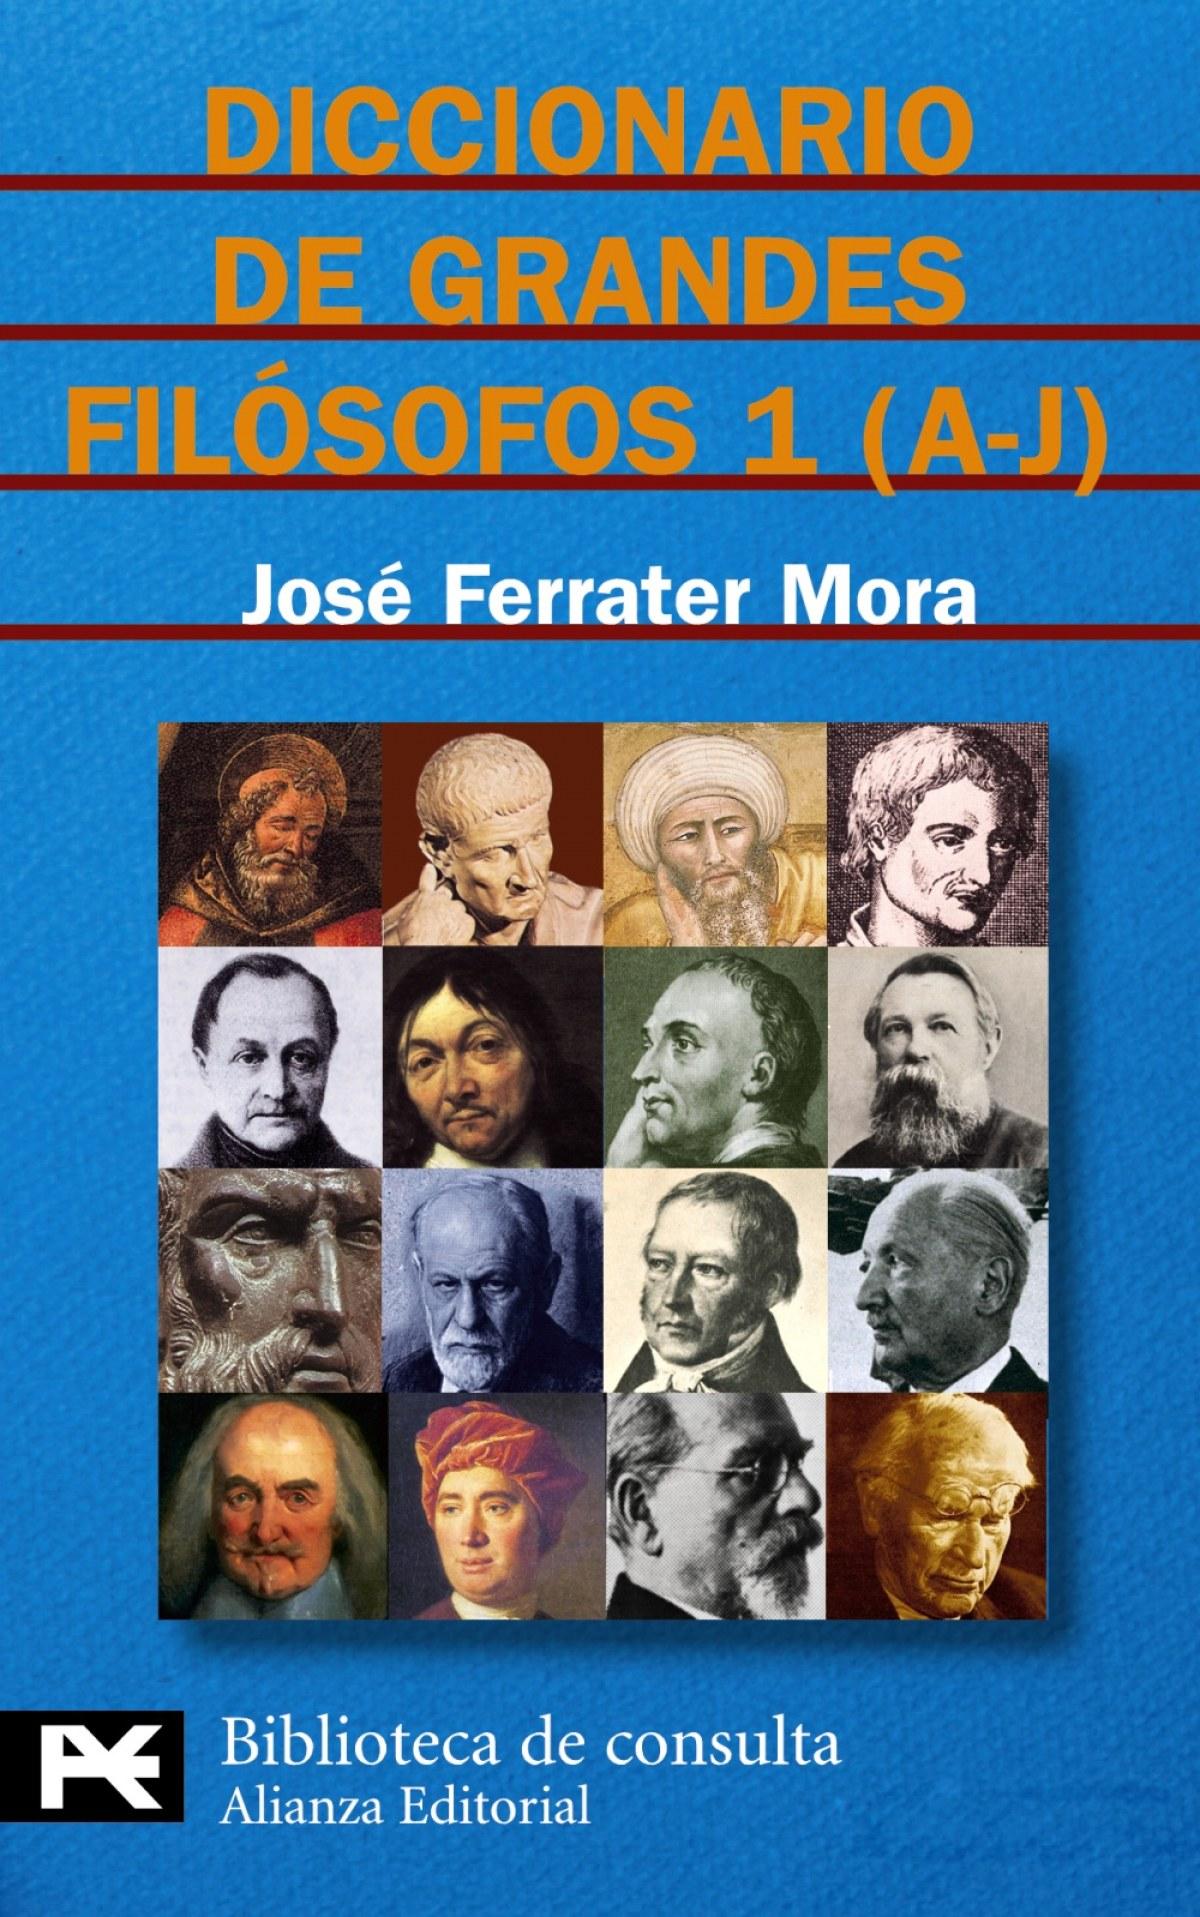 Diccionario de grandes filósofos, 1 (A-J) 9788420673134